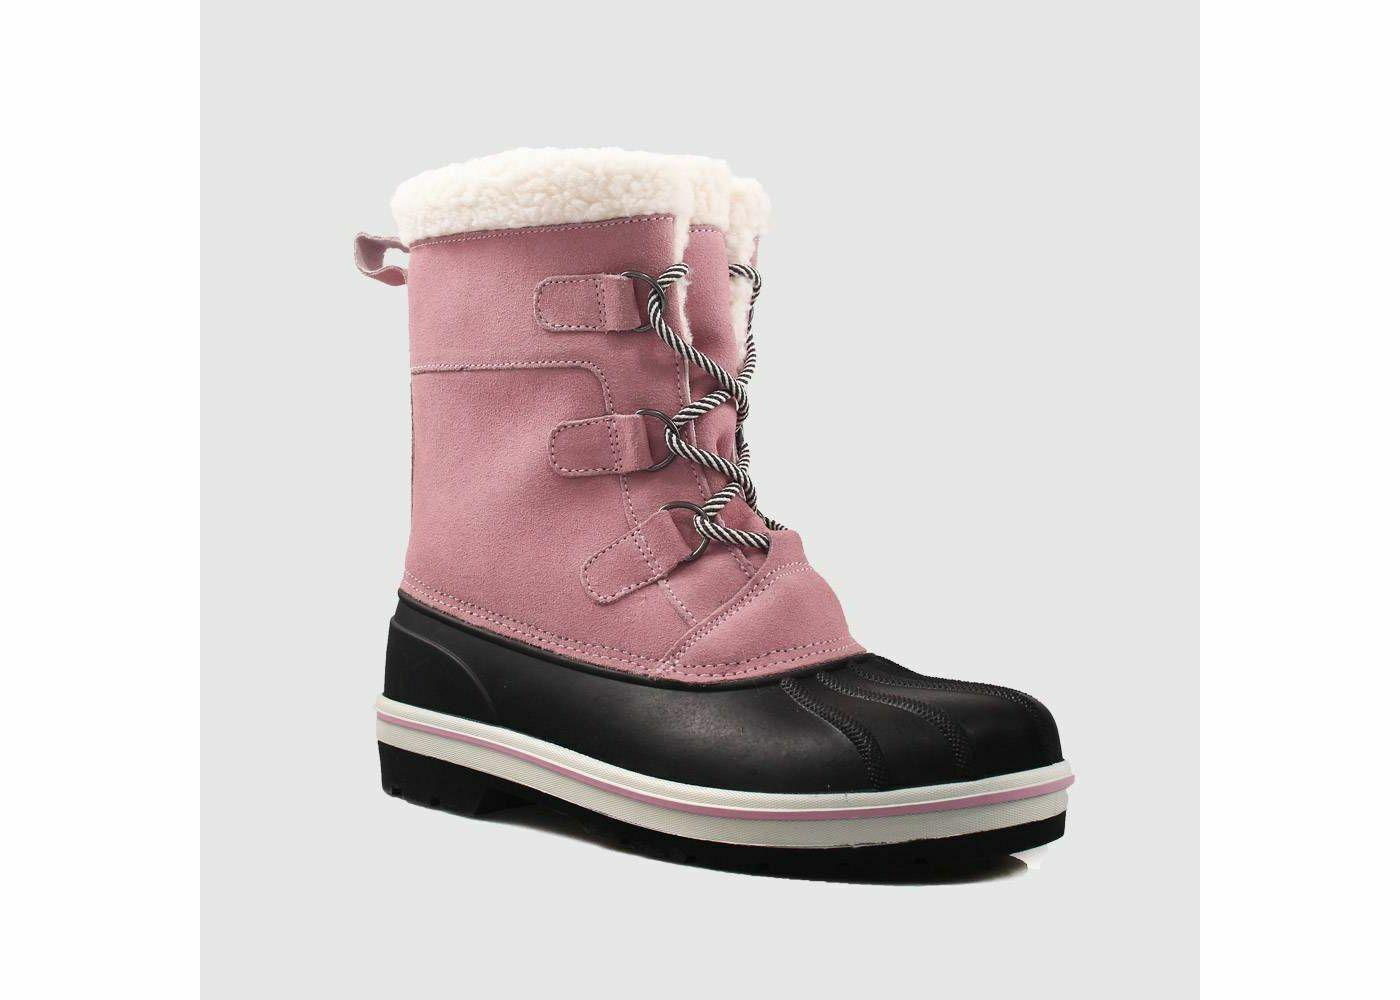 Girls/' Polly Neoprene Winter Boots Cat /& Jack Navy Blue Llama 1 NWT